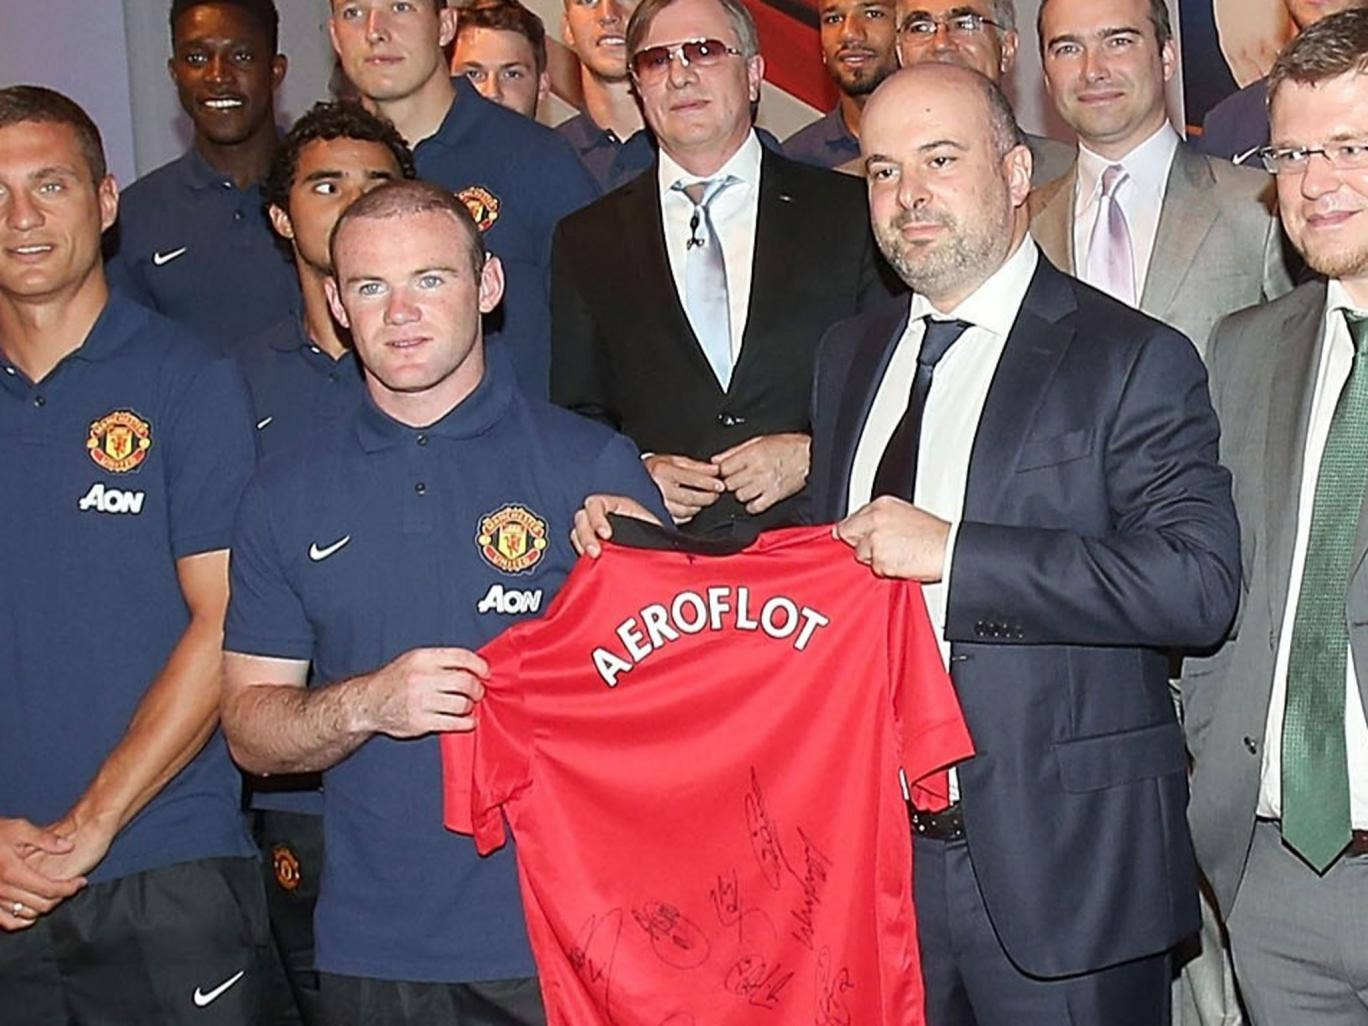 Wayne Rooney with representatives of Aeroflot